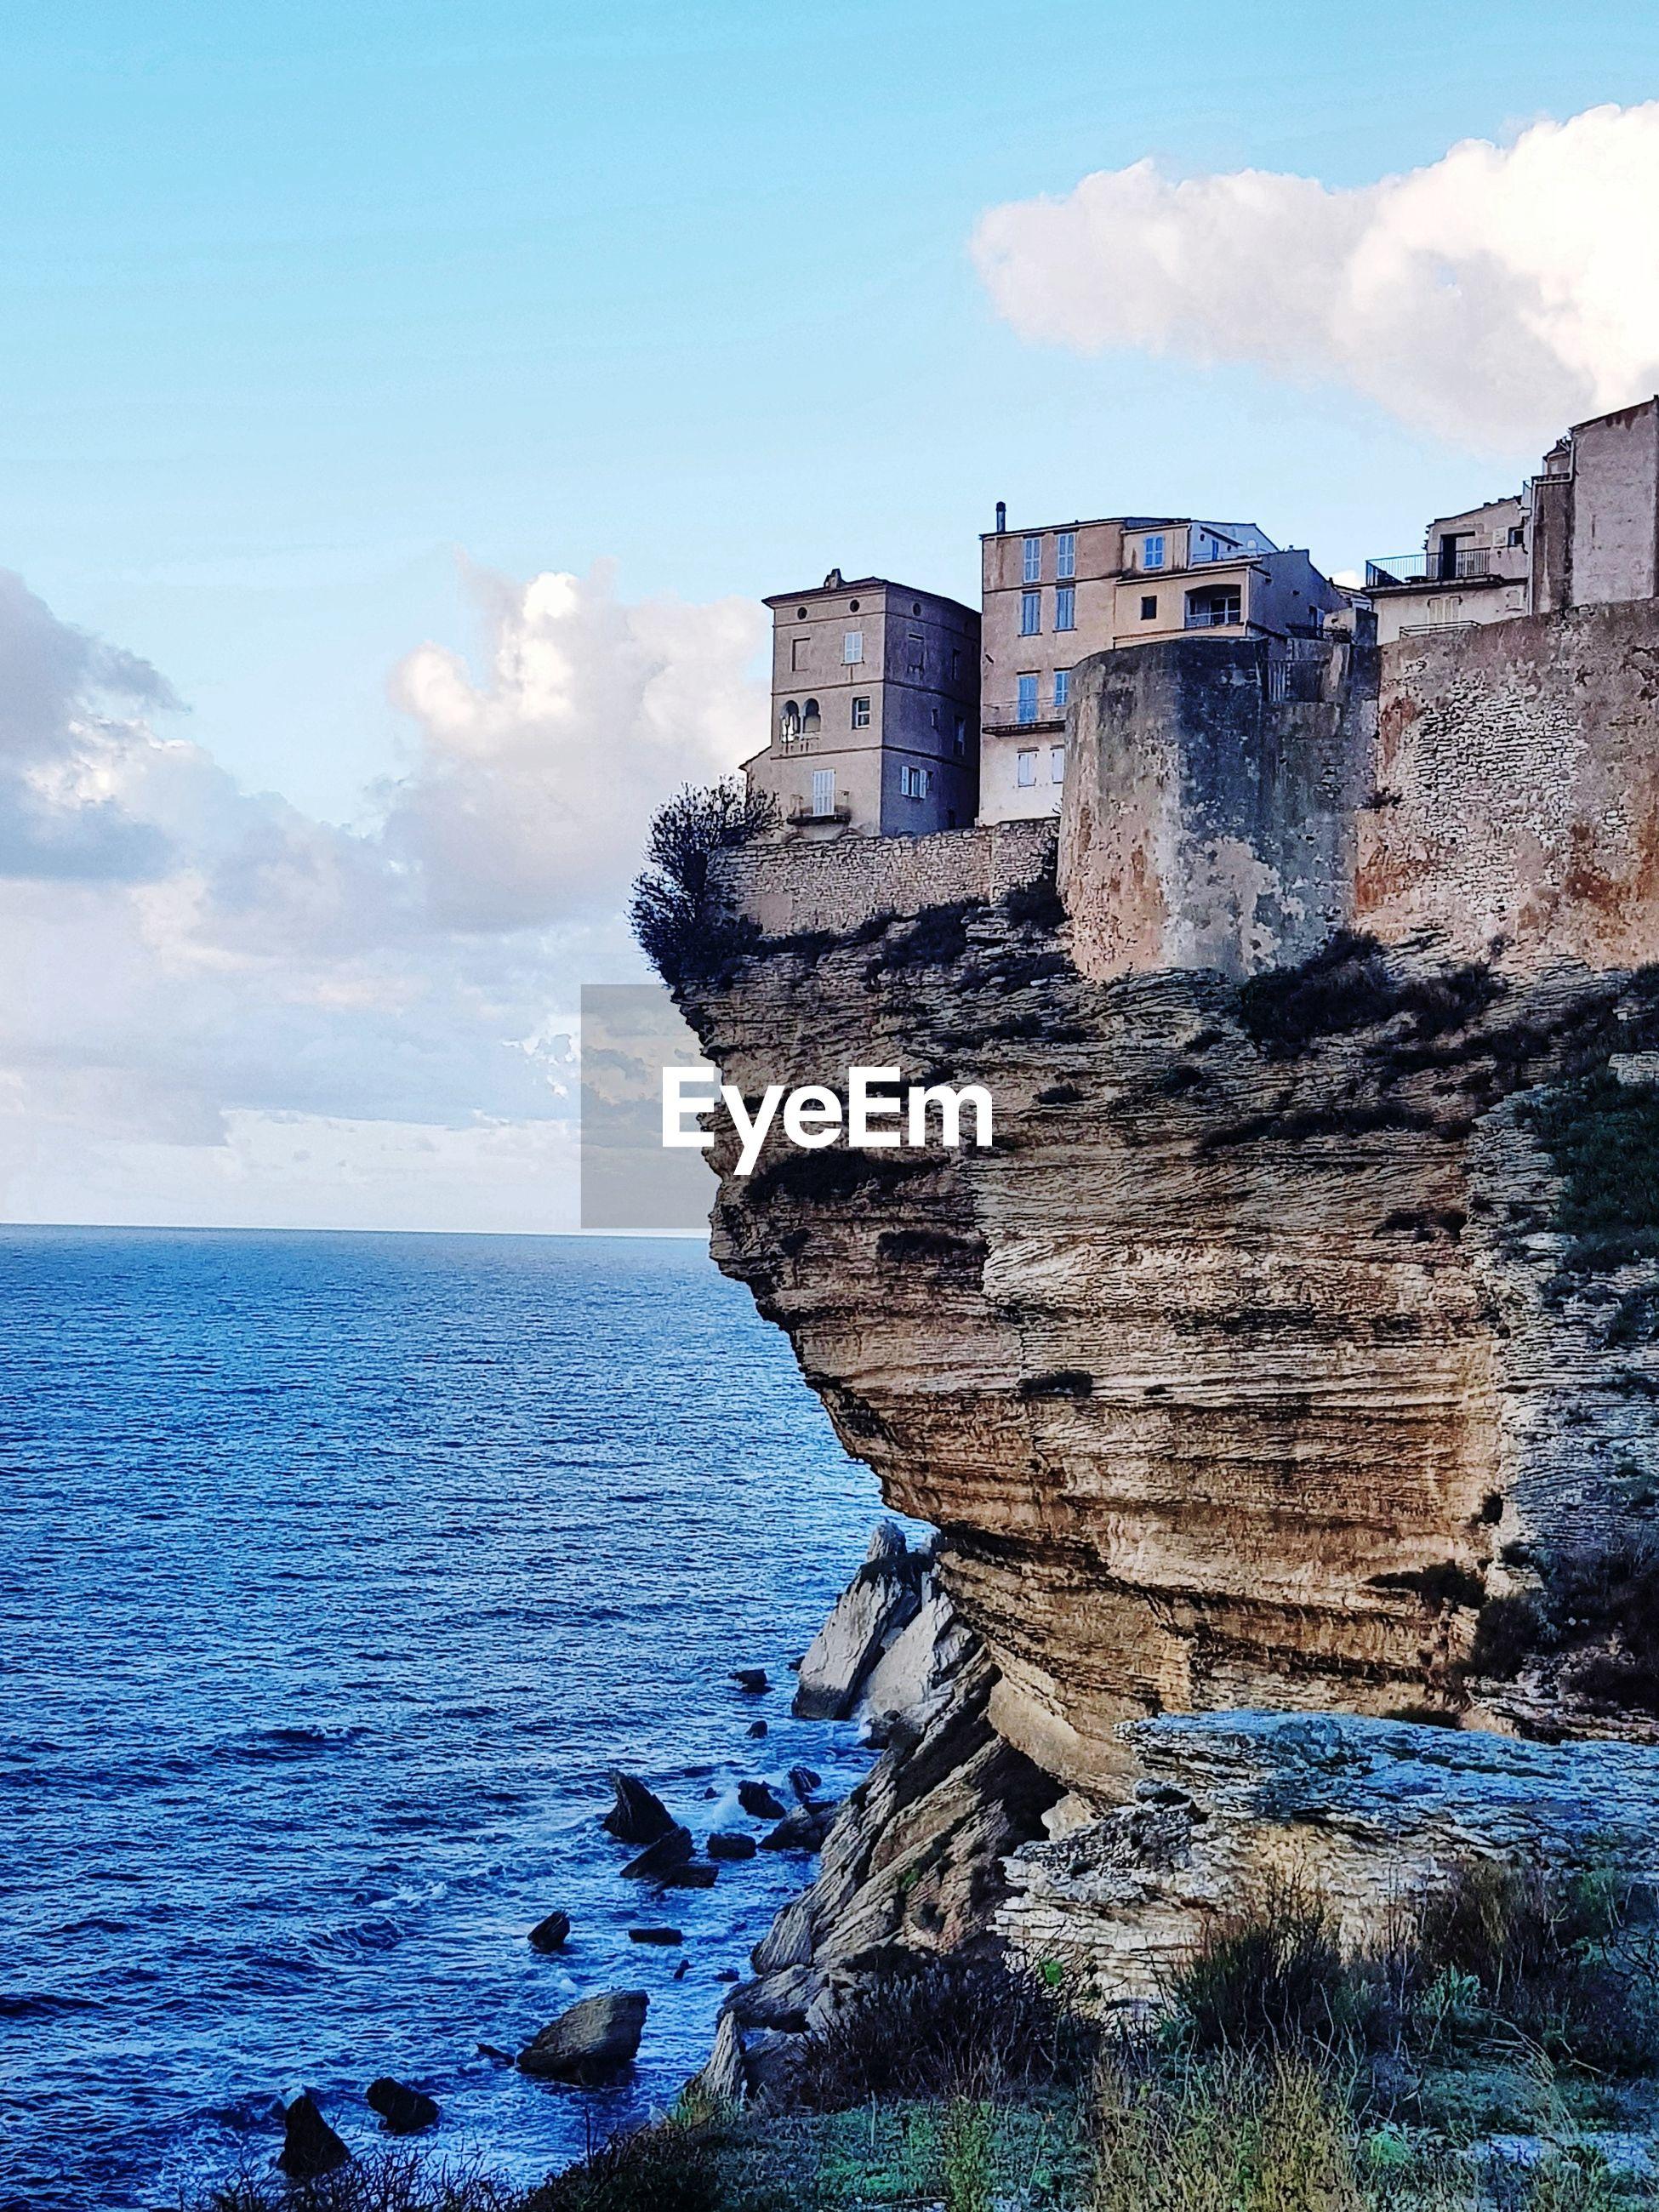 SEA SHORE AGAINST BUILDINGS